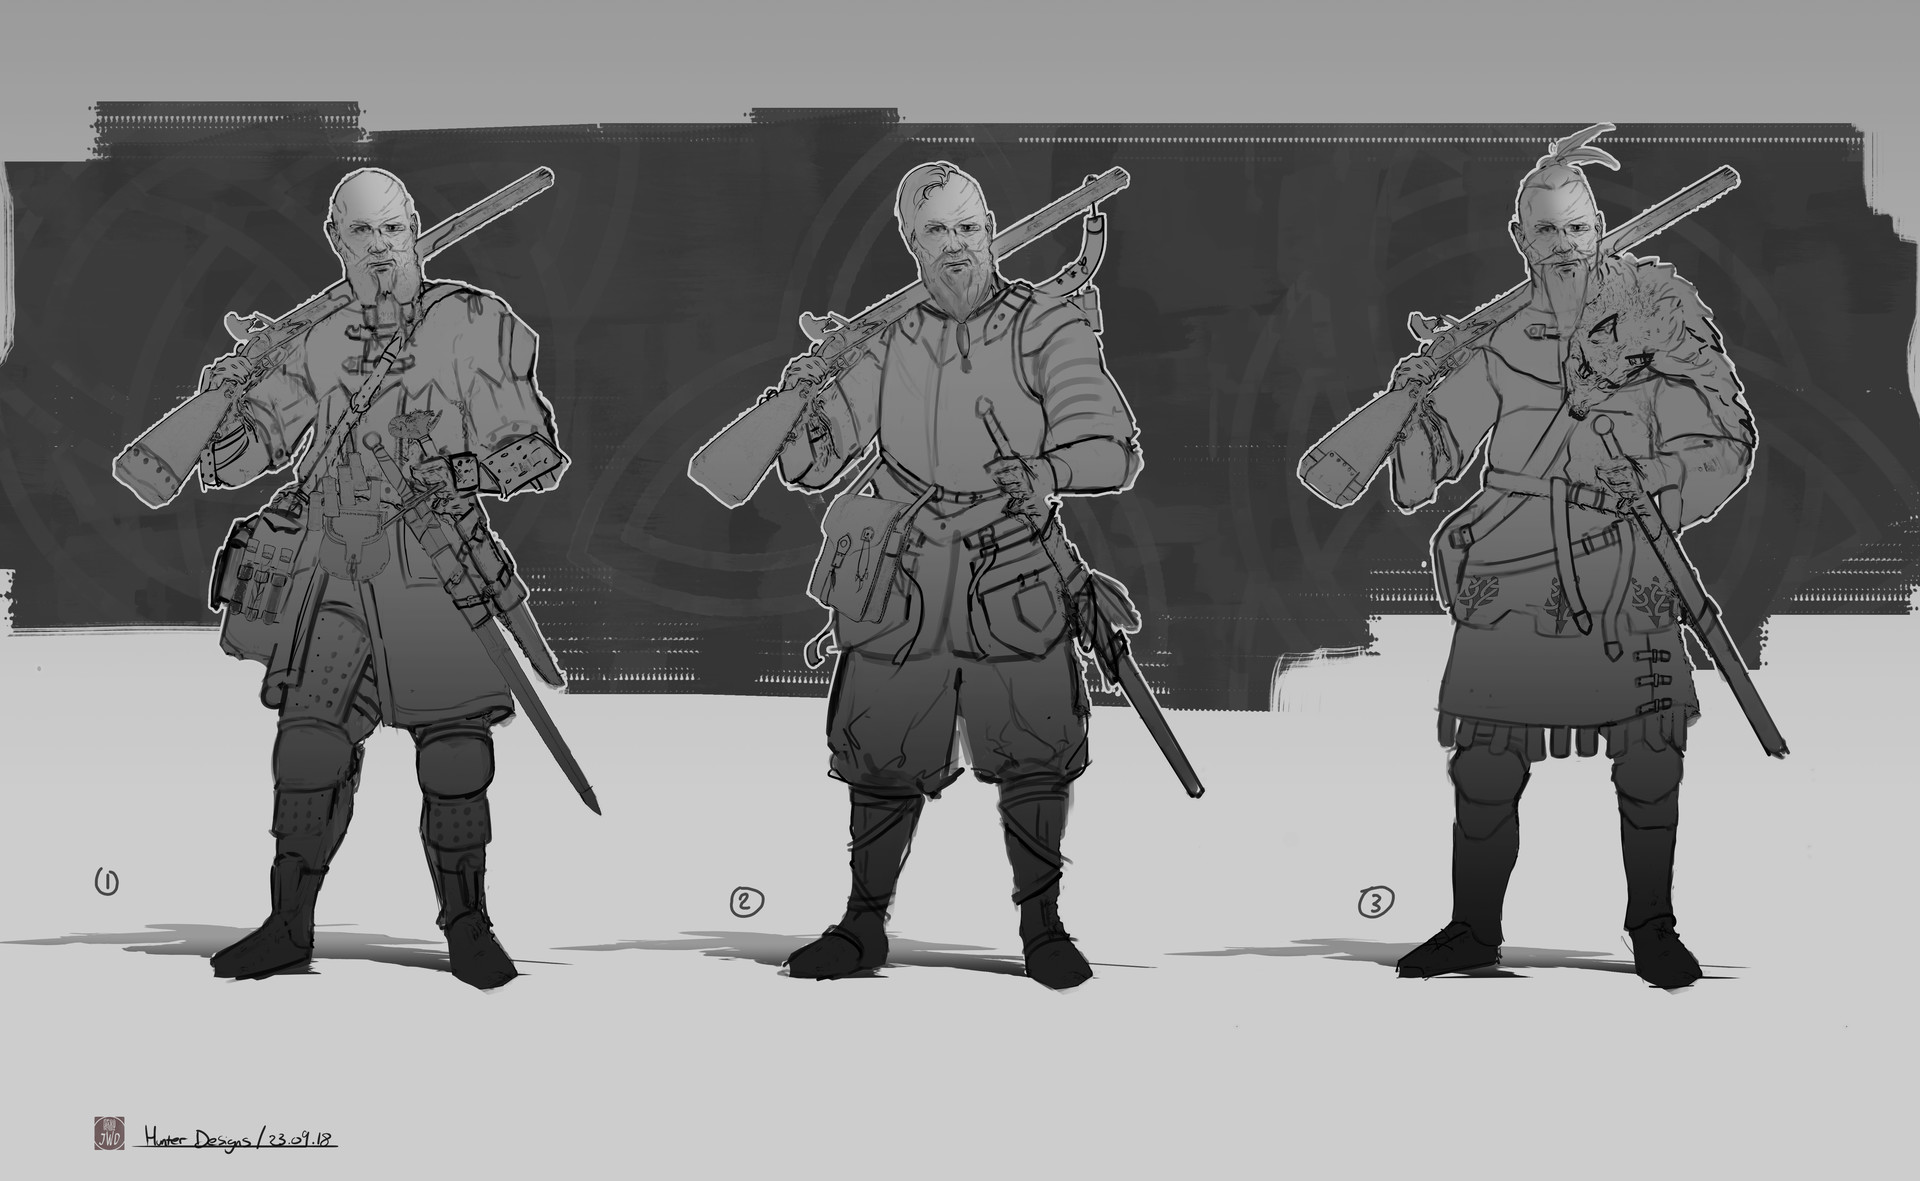 Jack dowell hunter designs line drawings